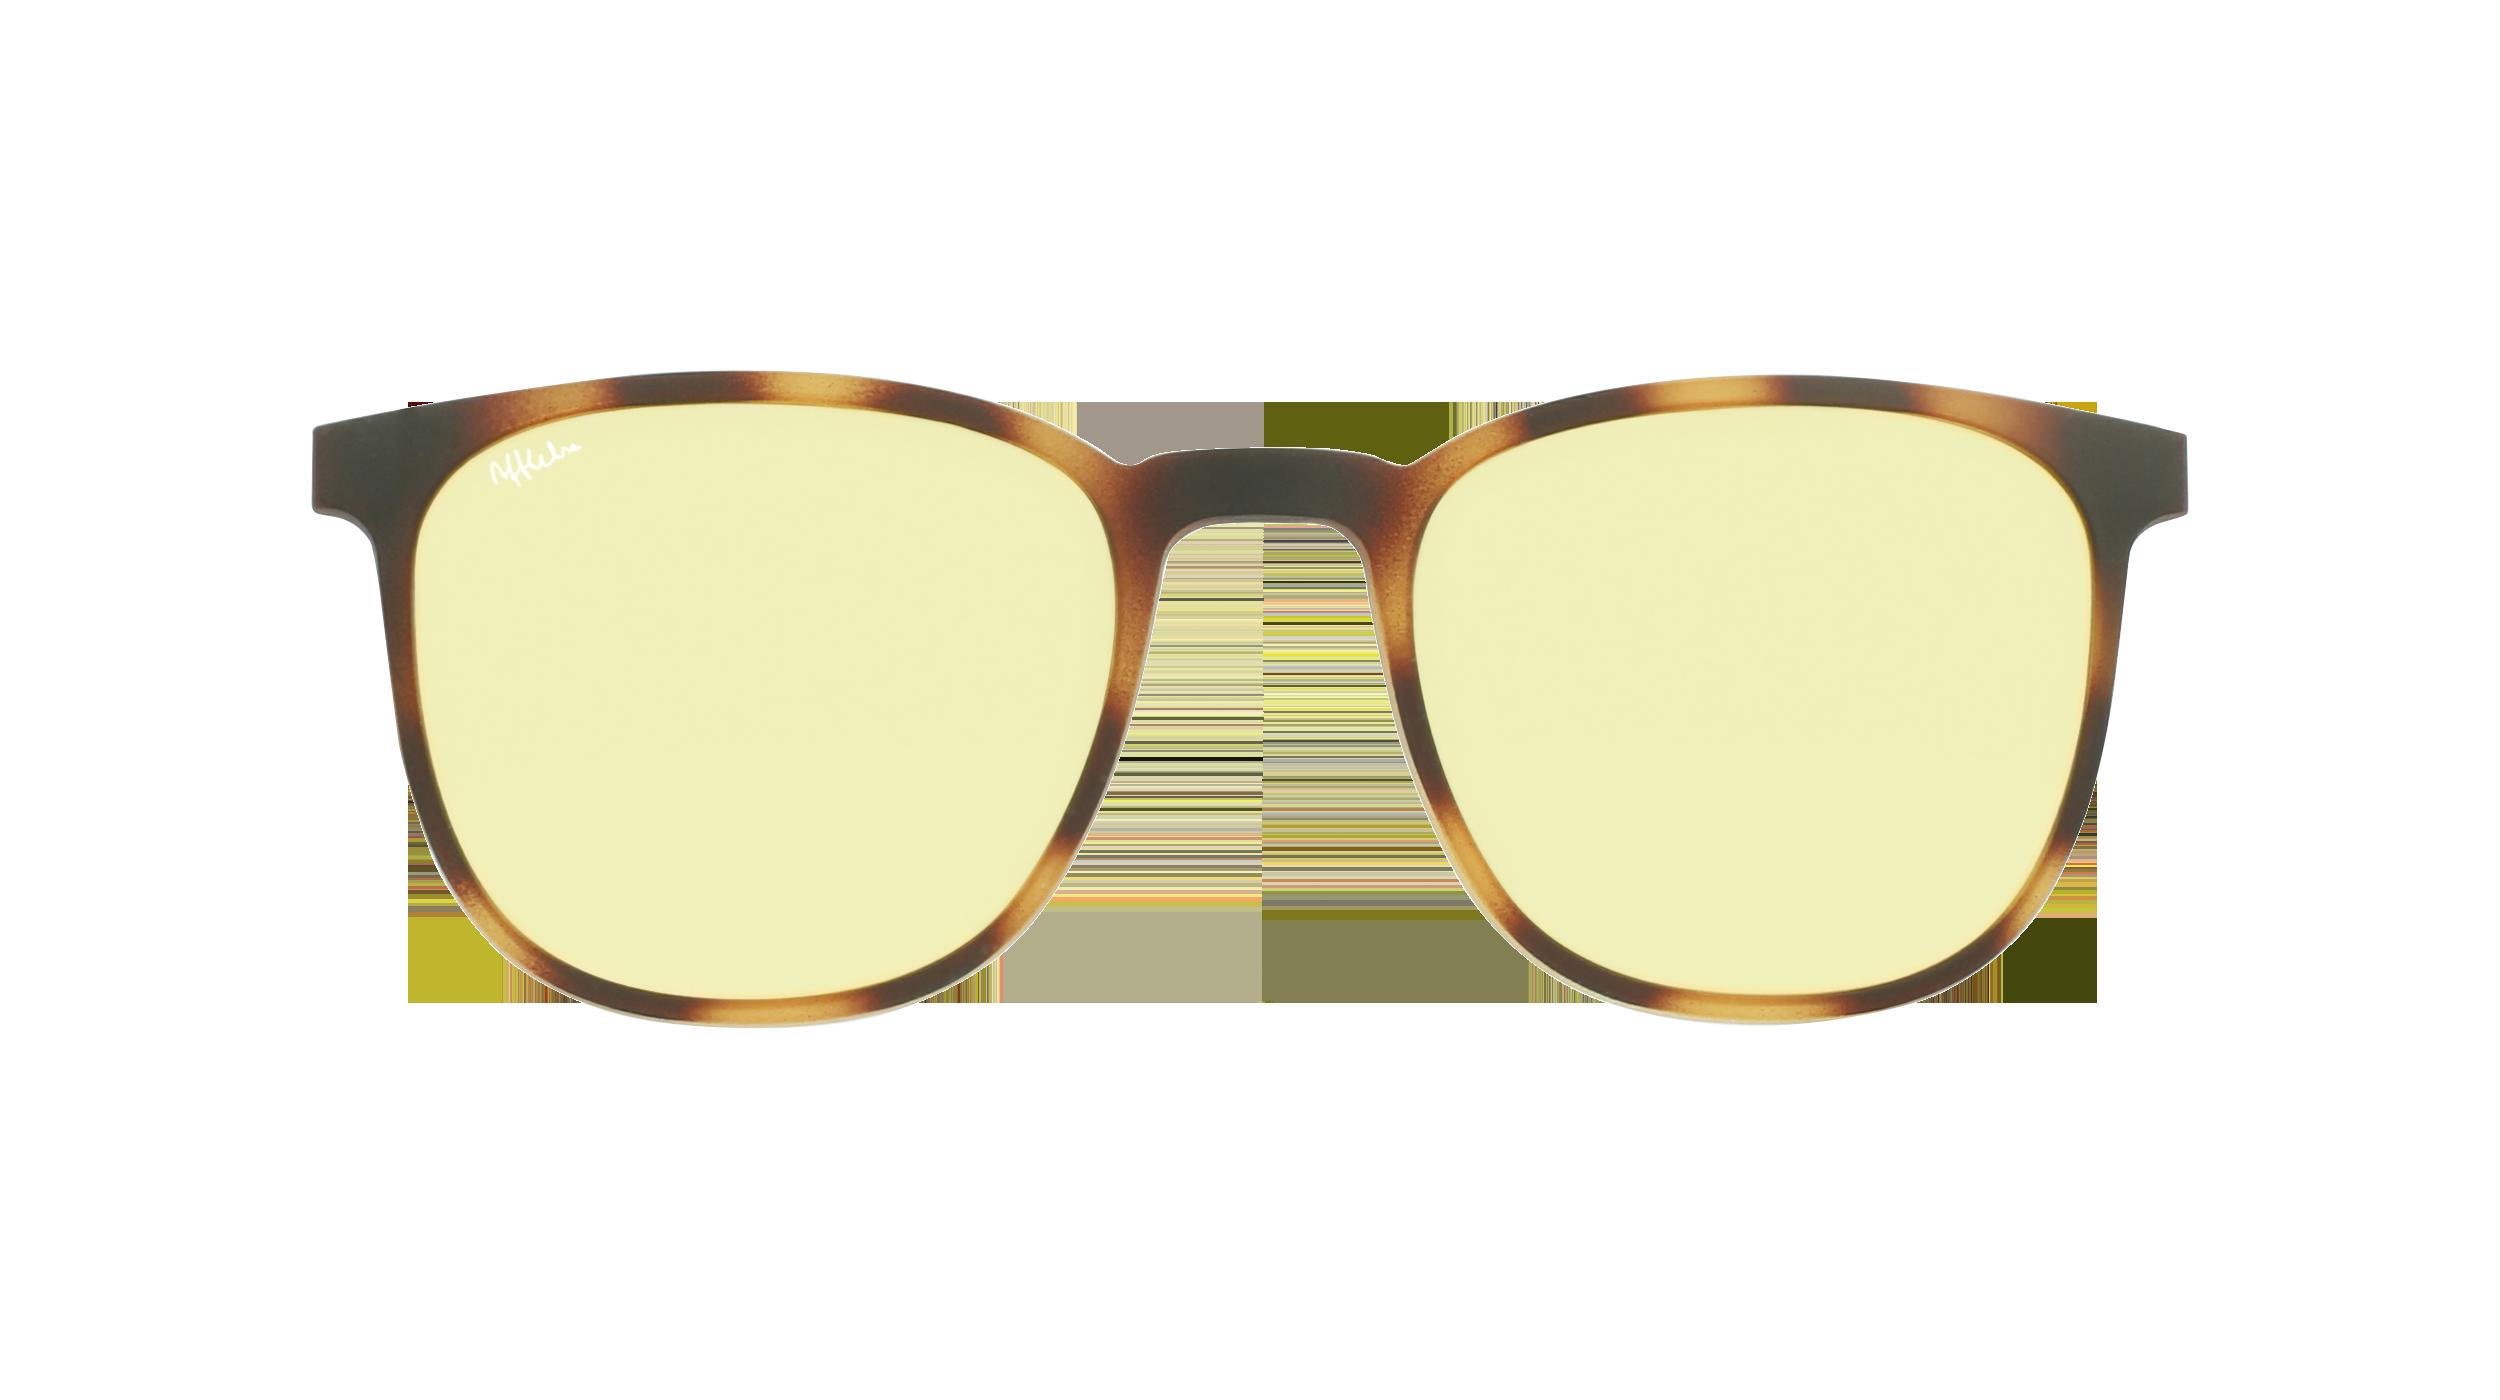 afflelou/france/products/smart_clip/clips_glasses/07630036457382.png